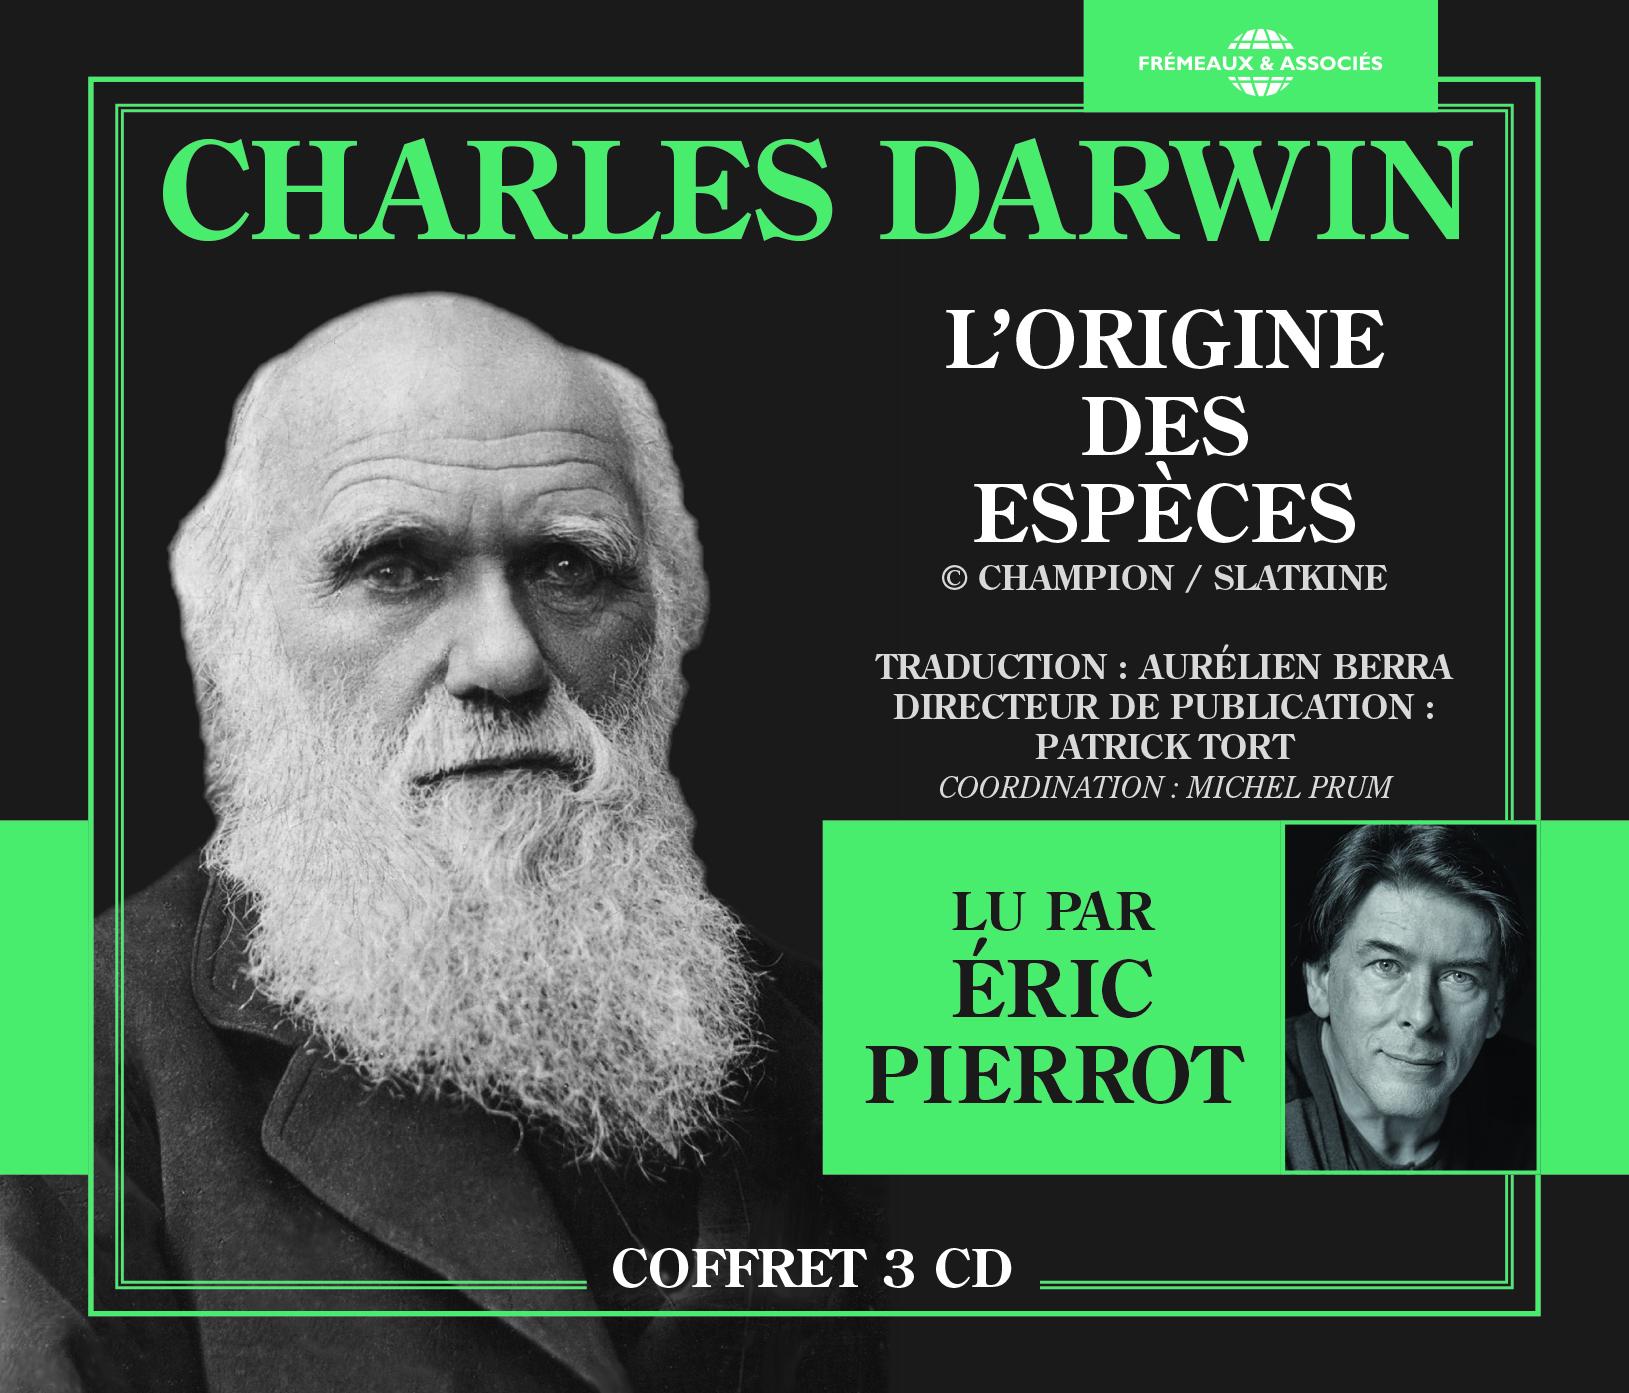 L ORIGINE DES ESPECES (LU PAR ERIC PIERROT)